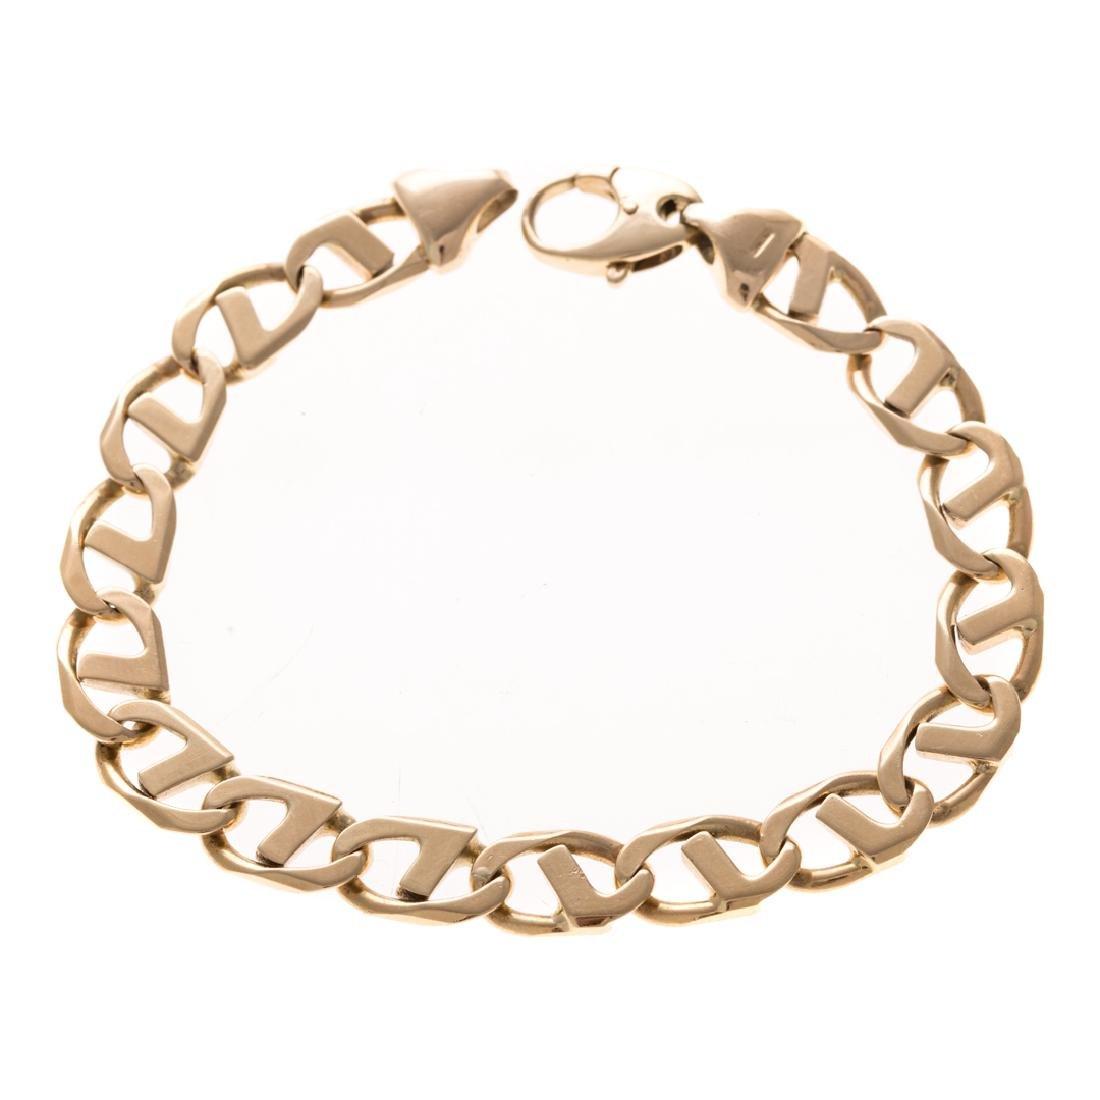 An Italian Anchor Link Bracelet in 14K Gold